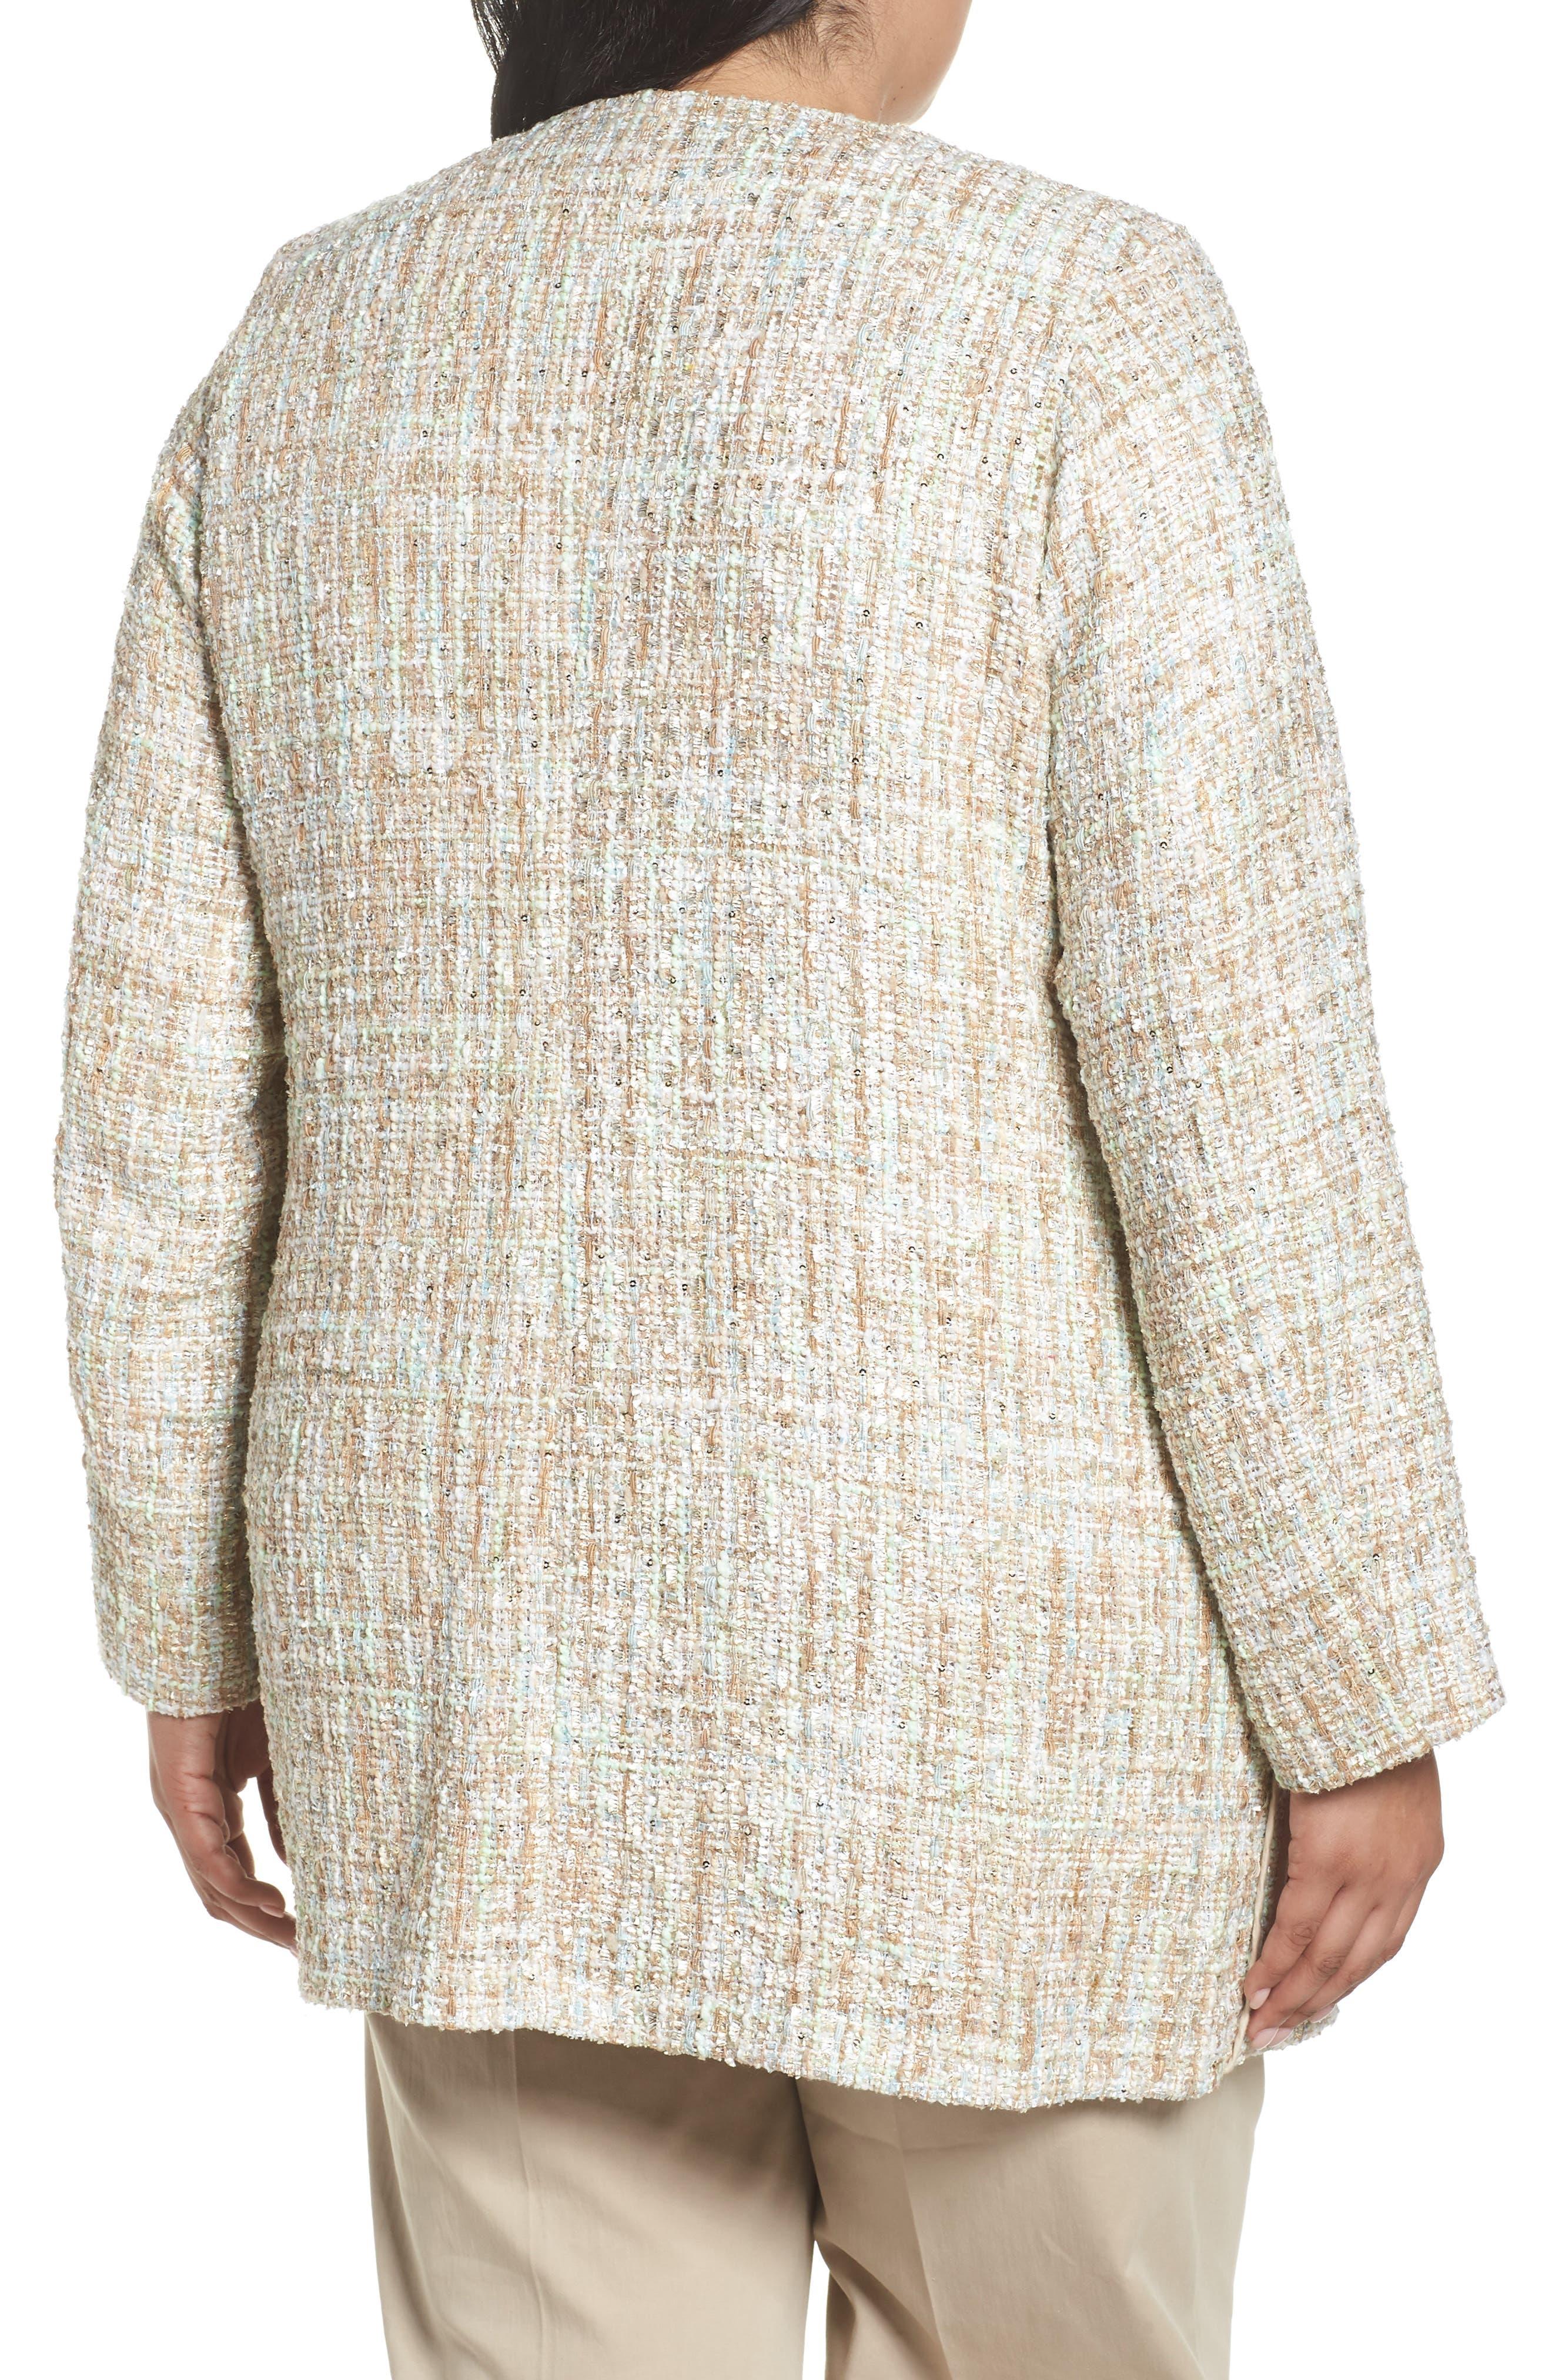 Metallic Tweed Jacket,                             Alternate thumbnail 2, color,                             White